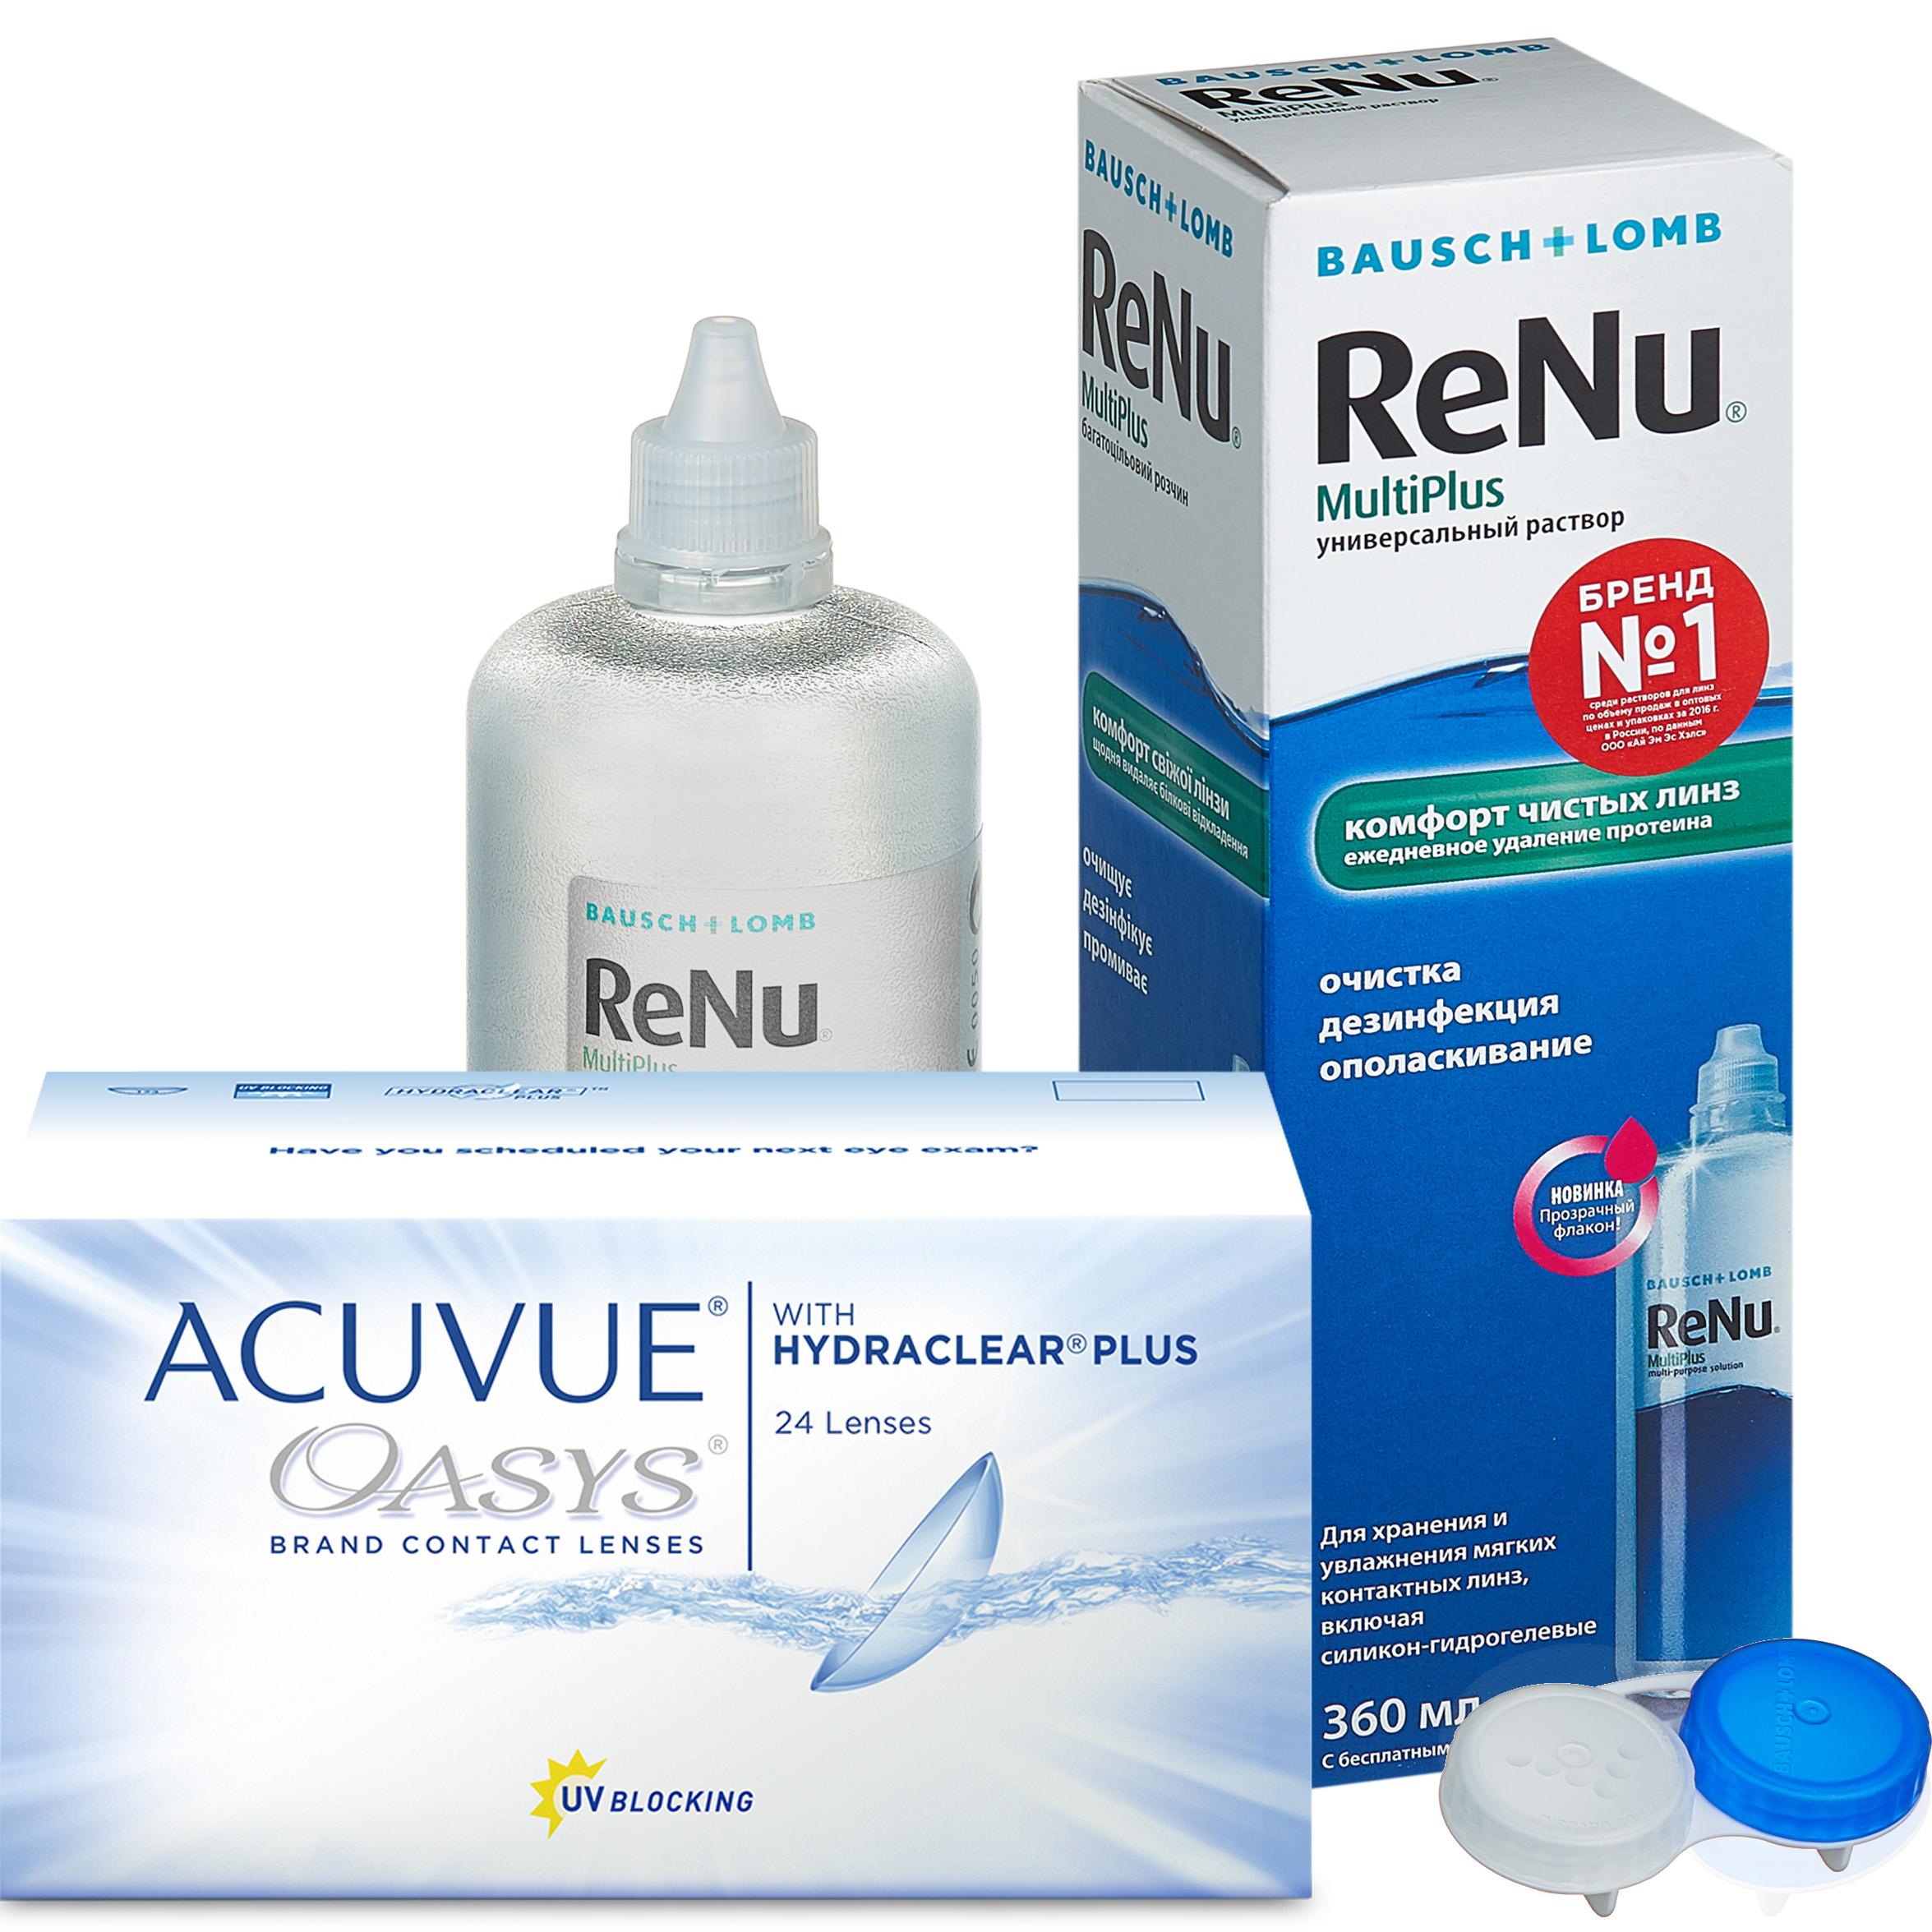 Купить Oasys with Hydraclear Plus 24 линзы + ReNu MultiPlus, Линзы Acuvue Oasys with Hydraclear Plus 24 линзы R 8.4 -11, 00 + ReNu Multi Plus 360 мл